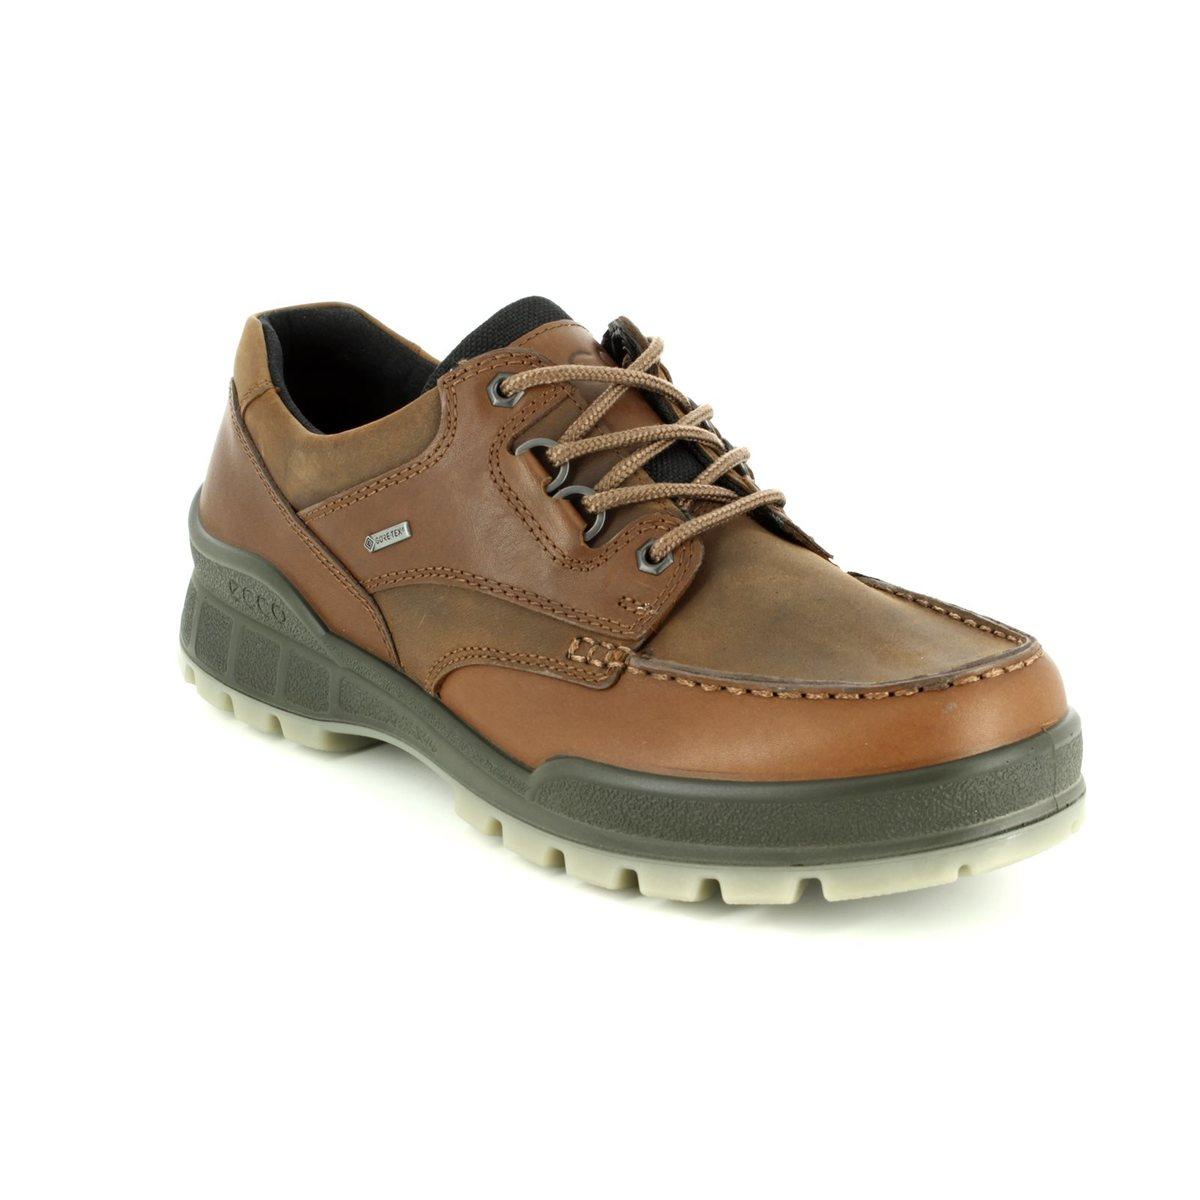 729d78750625 ECCO Casual Shoes - Brown multi - 831714 52600 TRACK 25 GORE-TEX